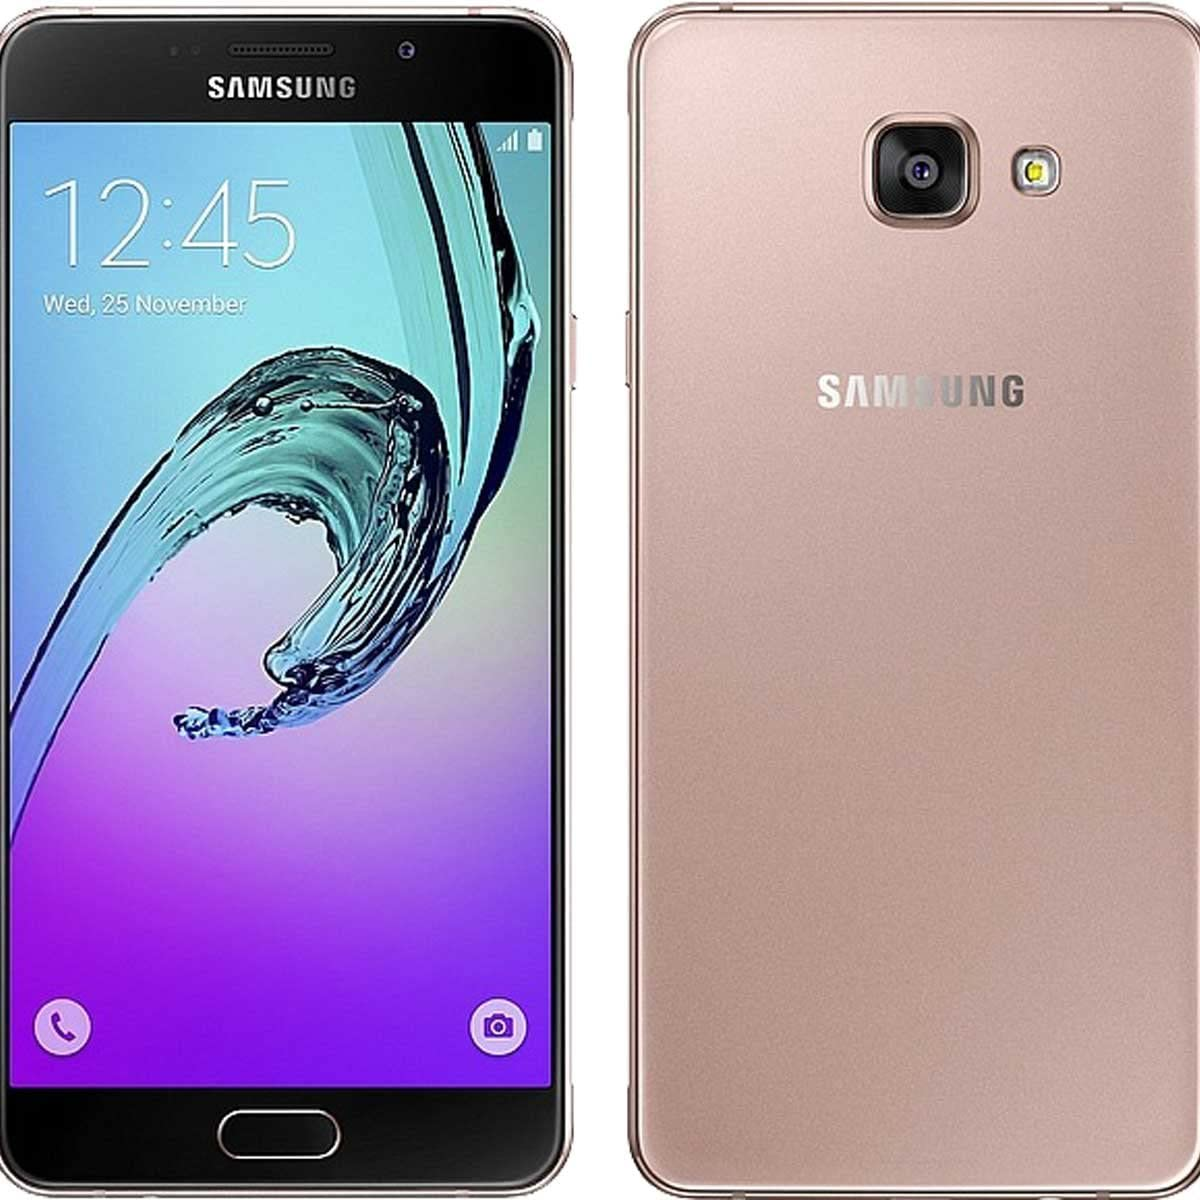 SMARTPHONE SAMSUNG GALAXY A5 (2016) PINK GOLD: Samsung: Amazon.es ...